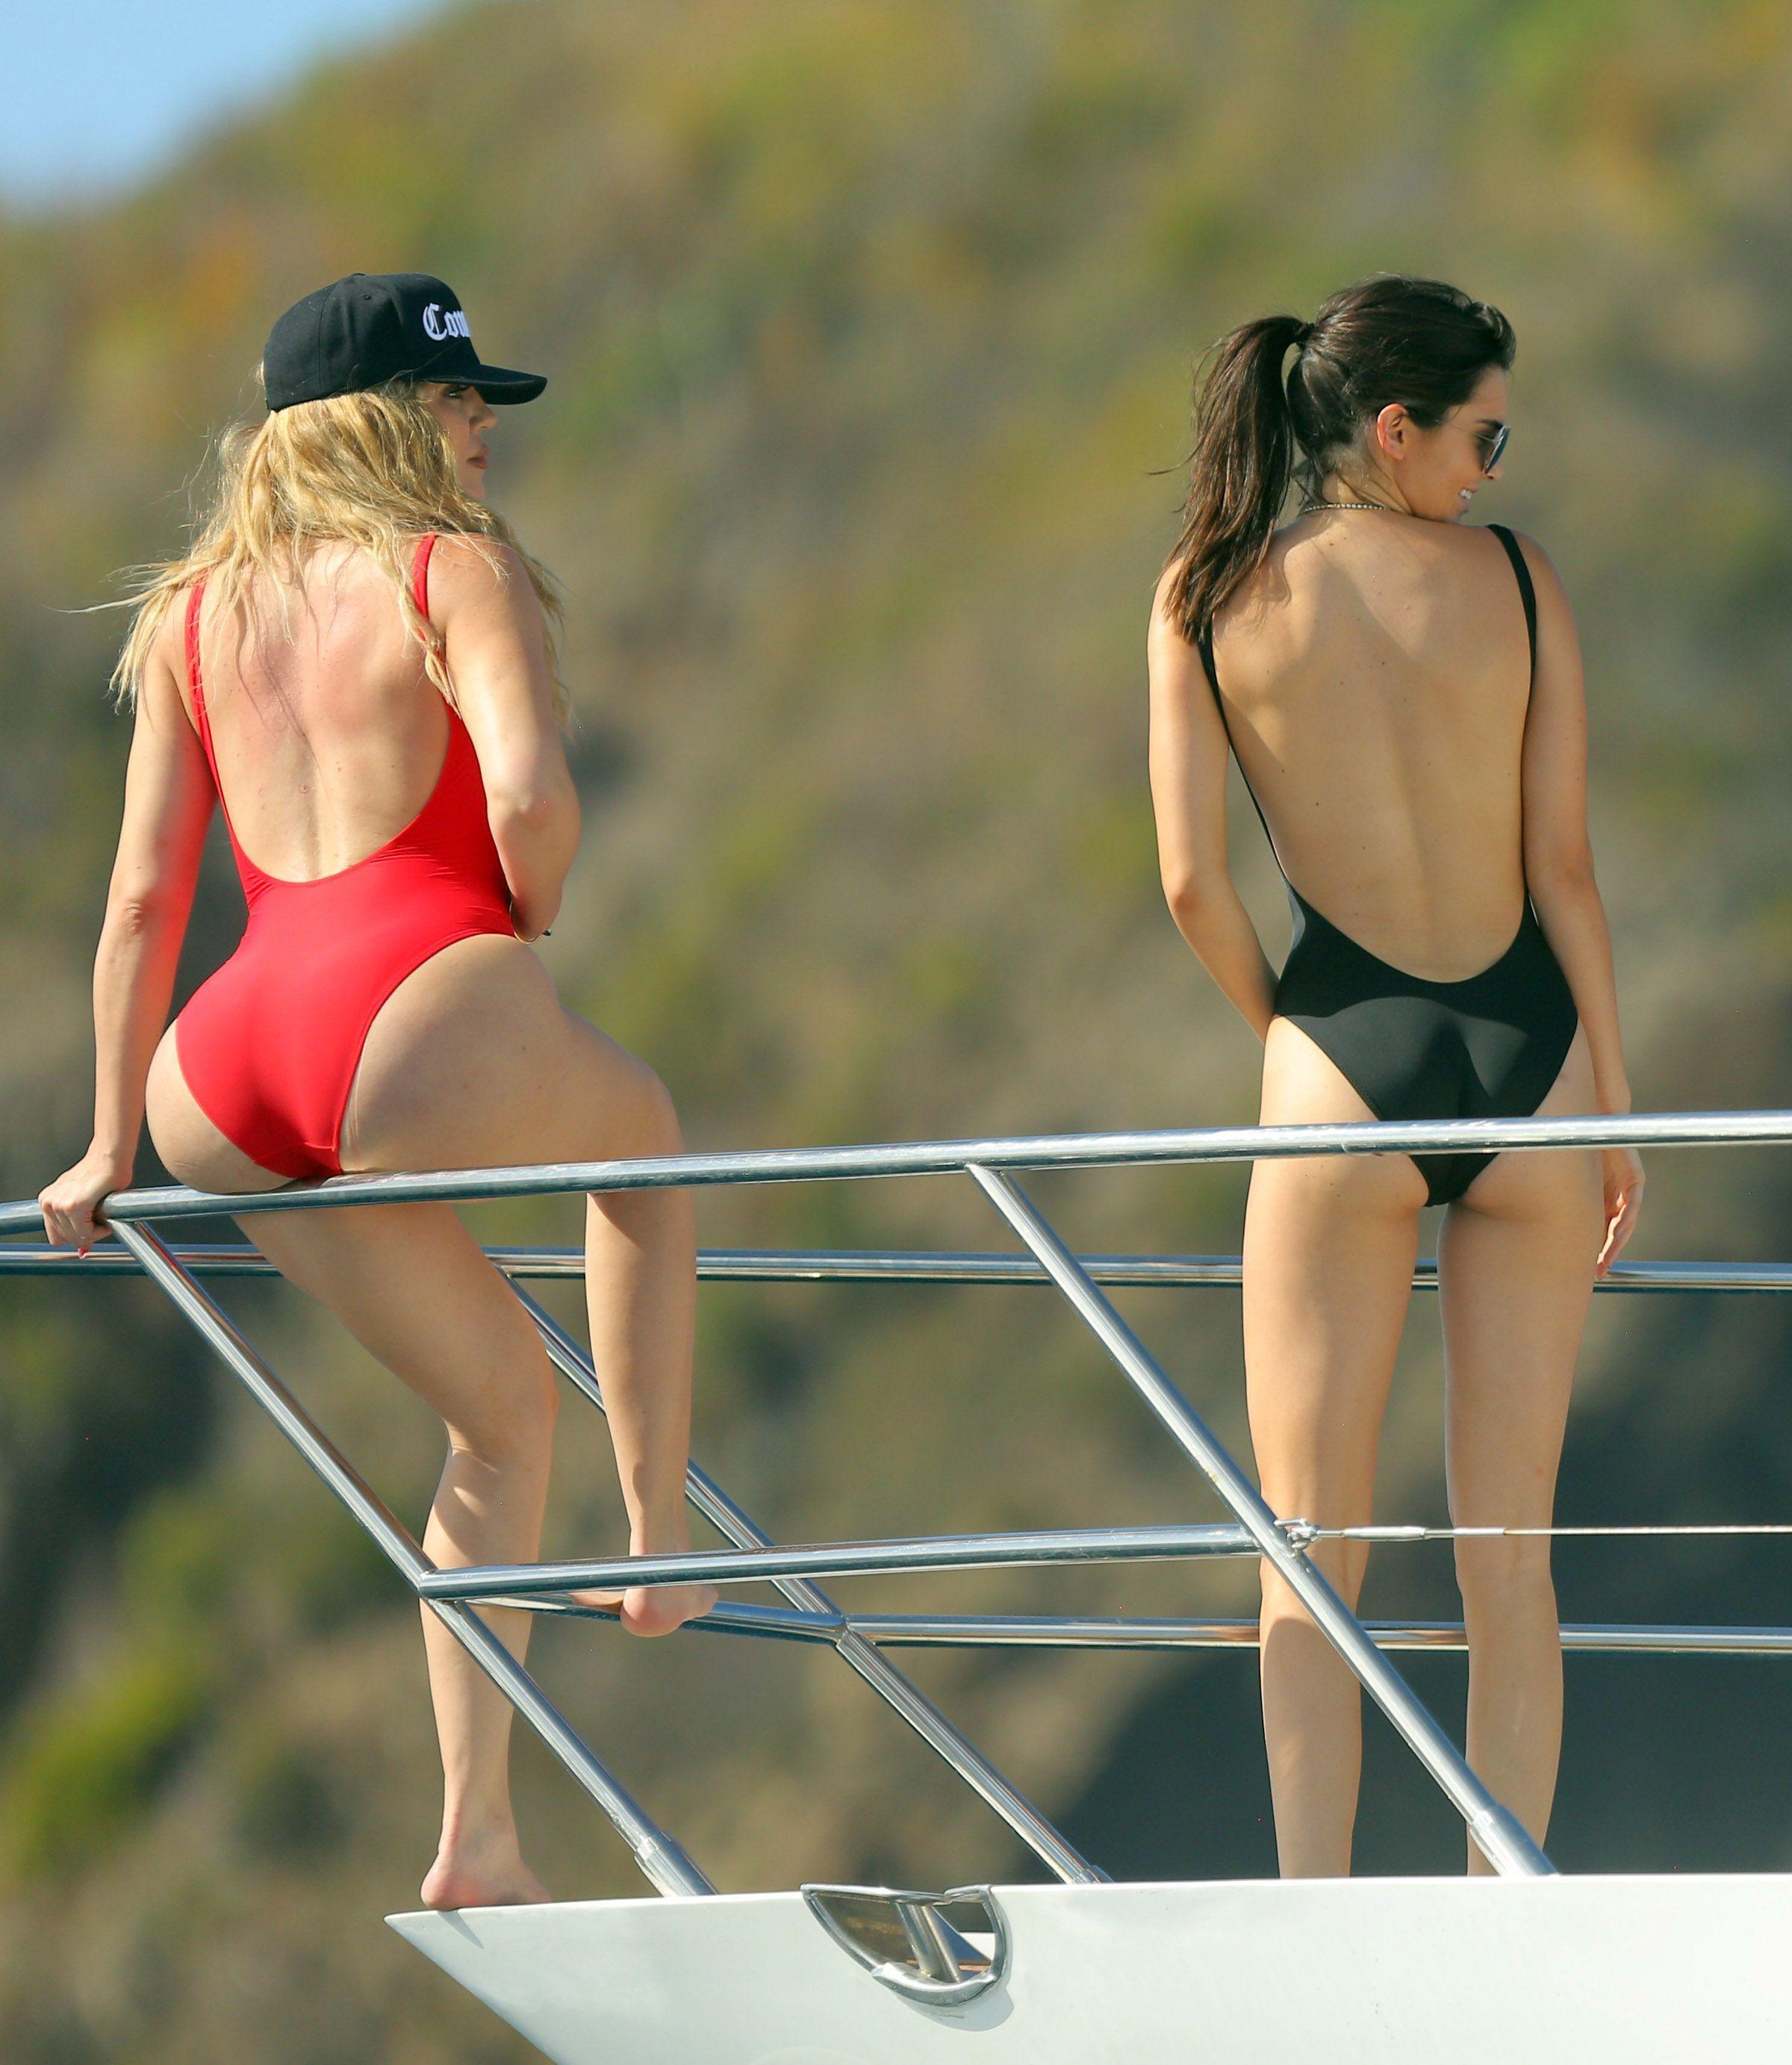 Kendall jenner khloe amp kourtney kardashian uncensored 2